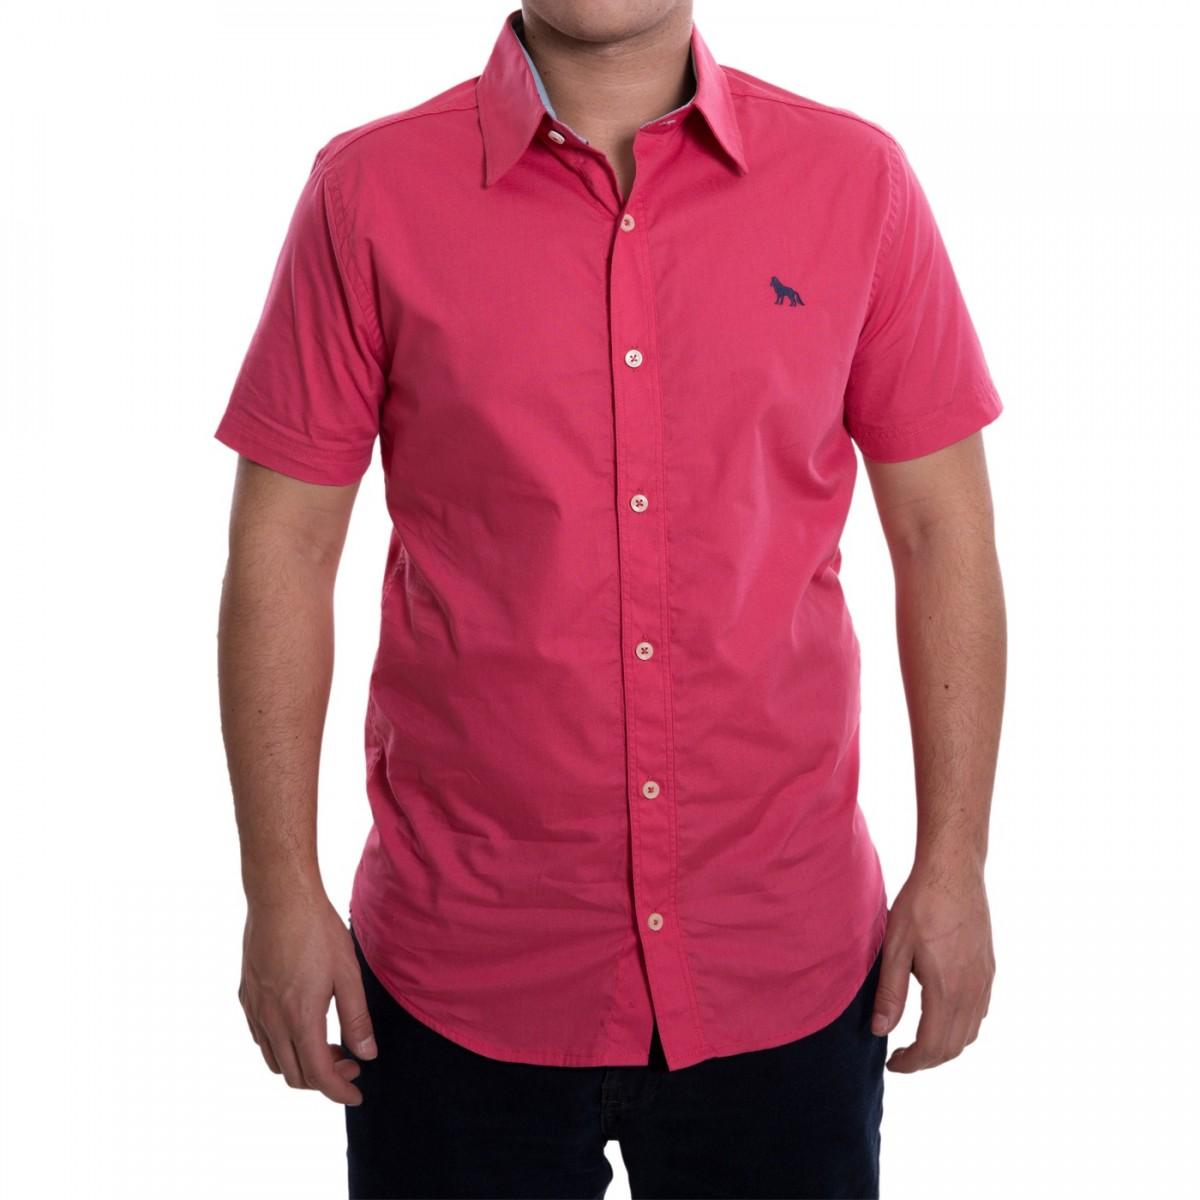 2f8aaa59f Bizz Store - Camisa Social Masculina Acostamento Manga Curta